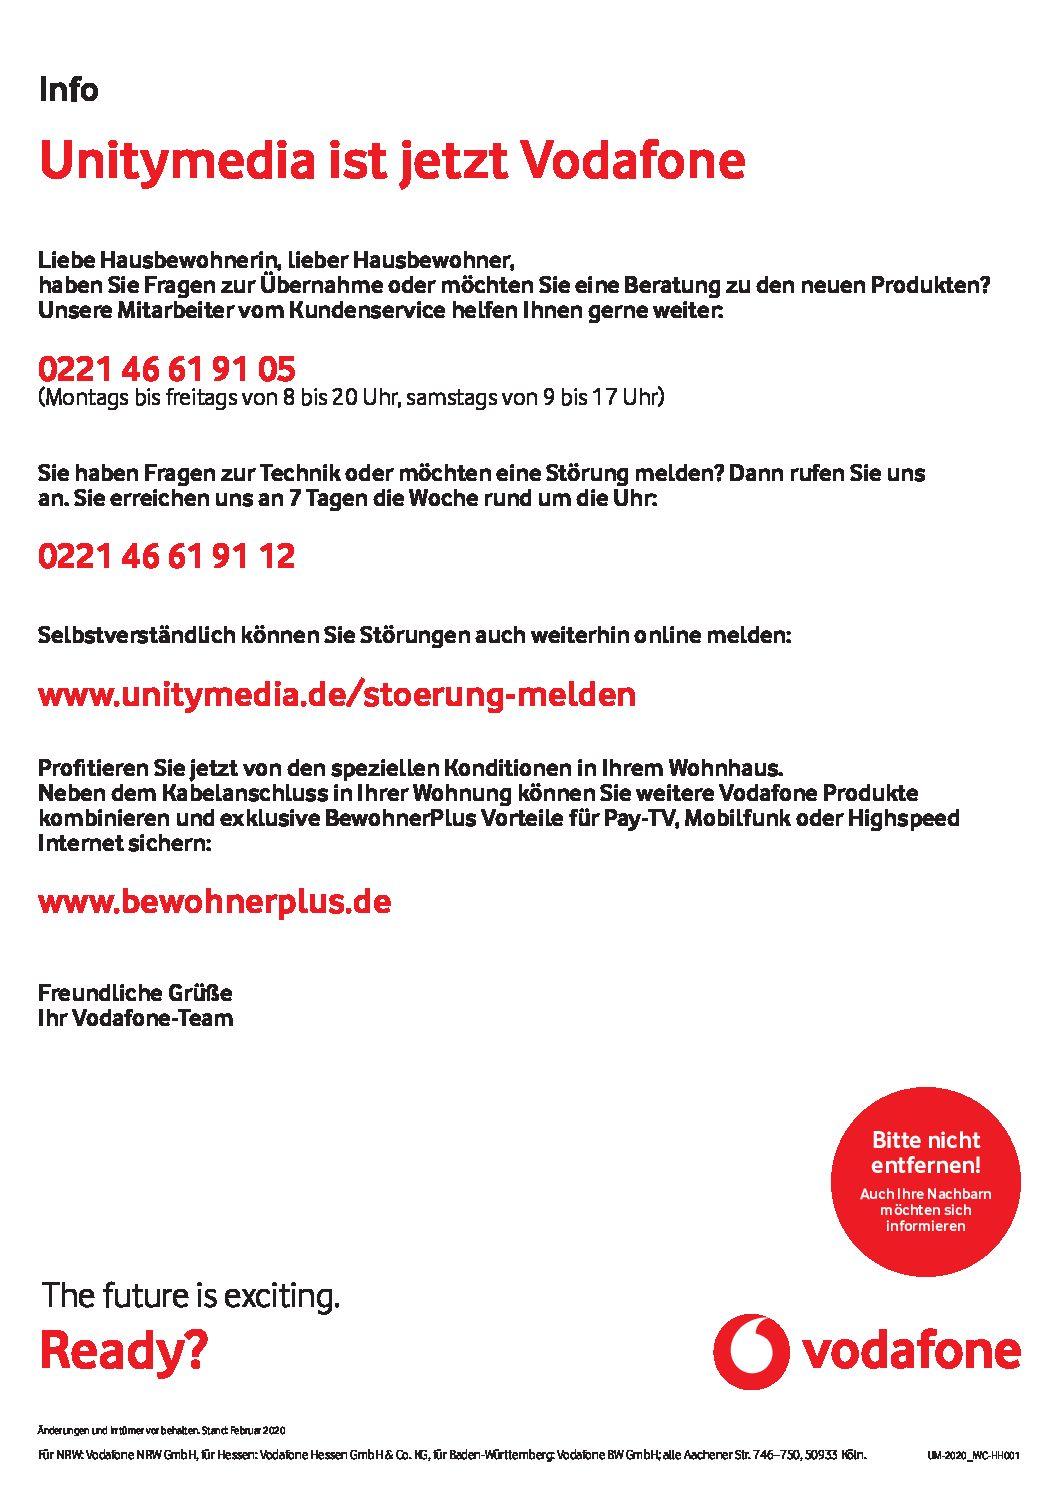 Info: Unitymedia ist jetzt Vodafone!